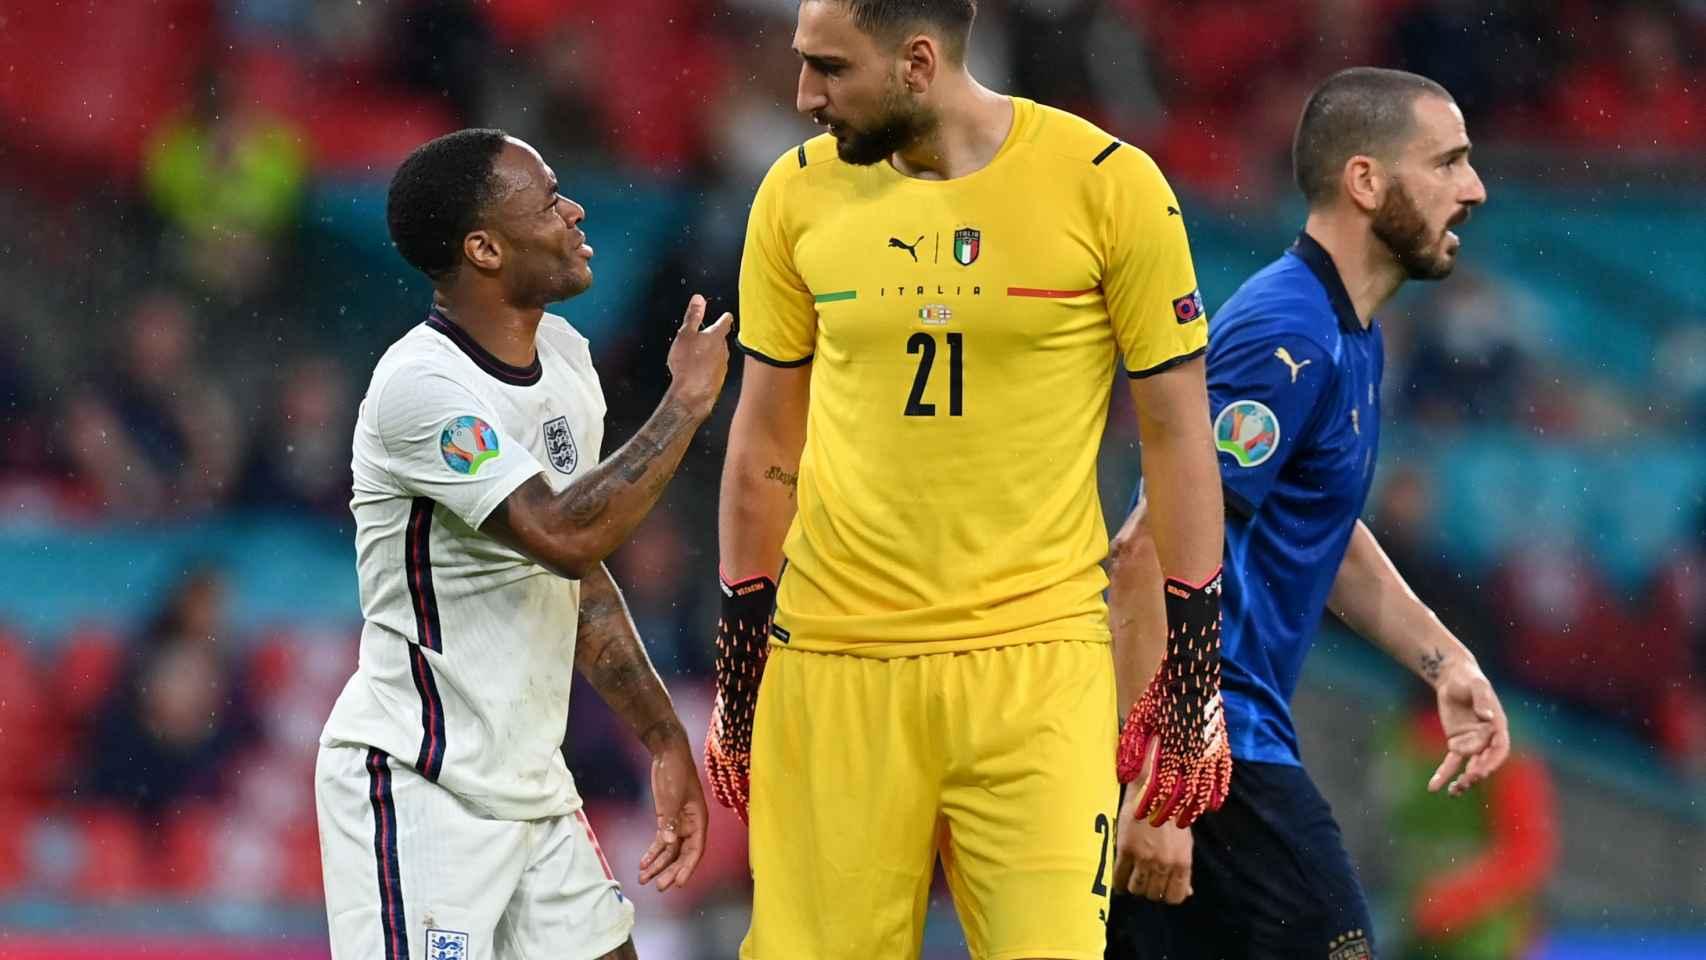 La final de la Eurocopa 2020 entre Italia e Inglaterra